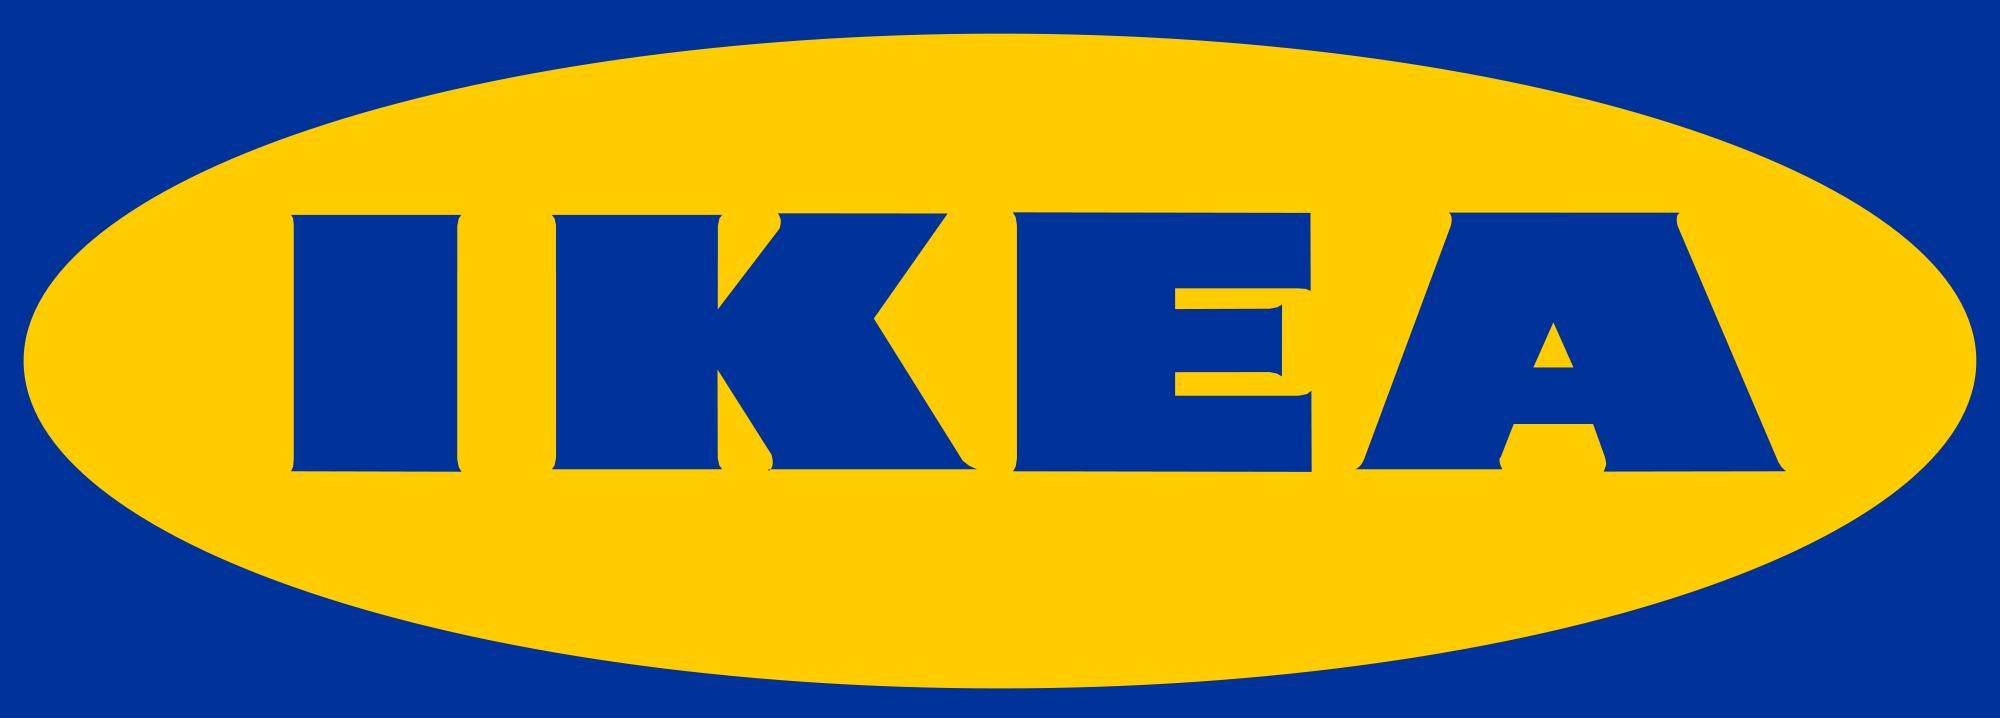 Ikea,lt